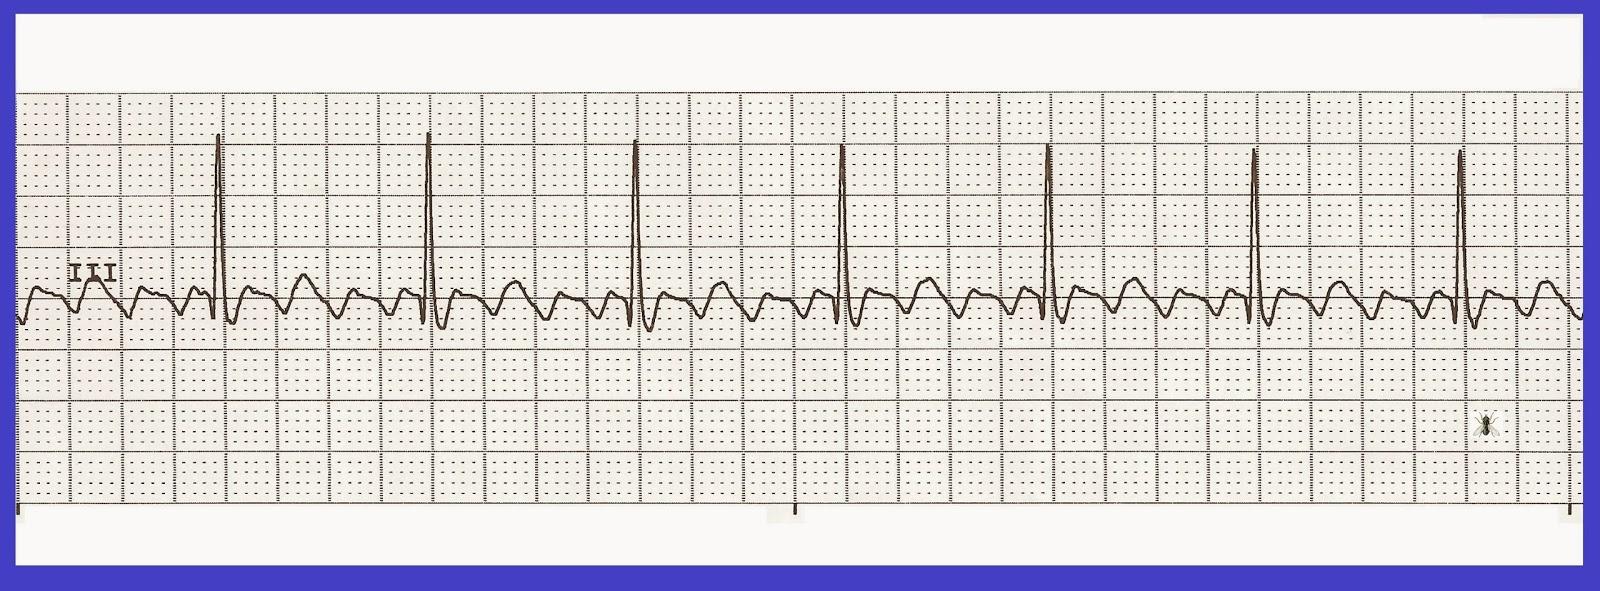 Atrial Flutter vs Atrial Fibrillation AFib: 11 Common